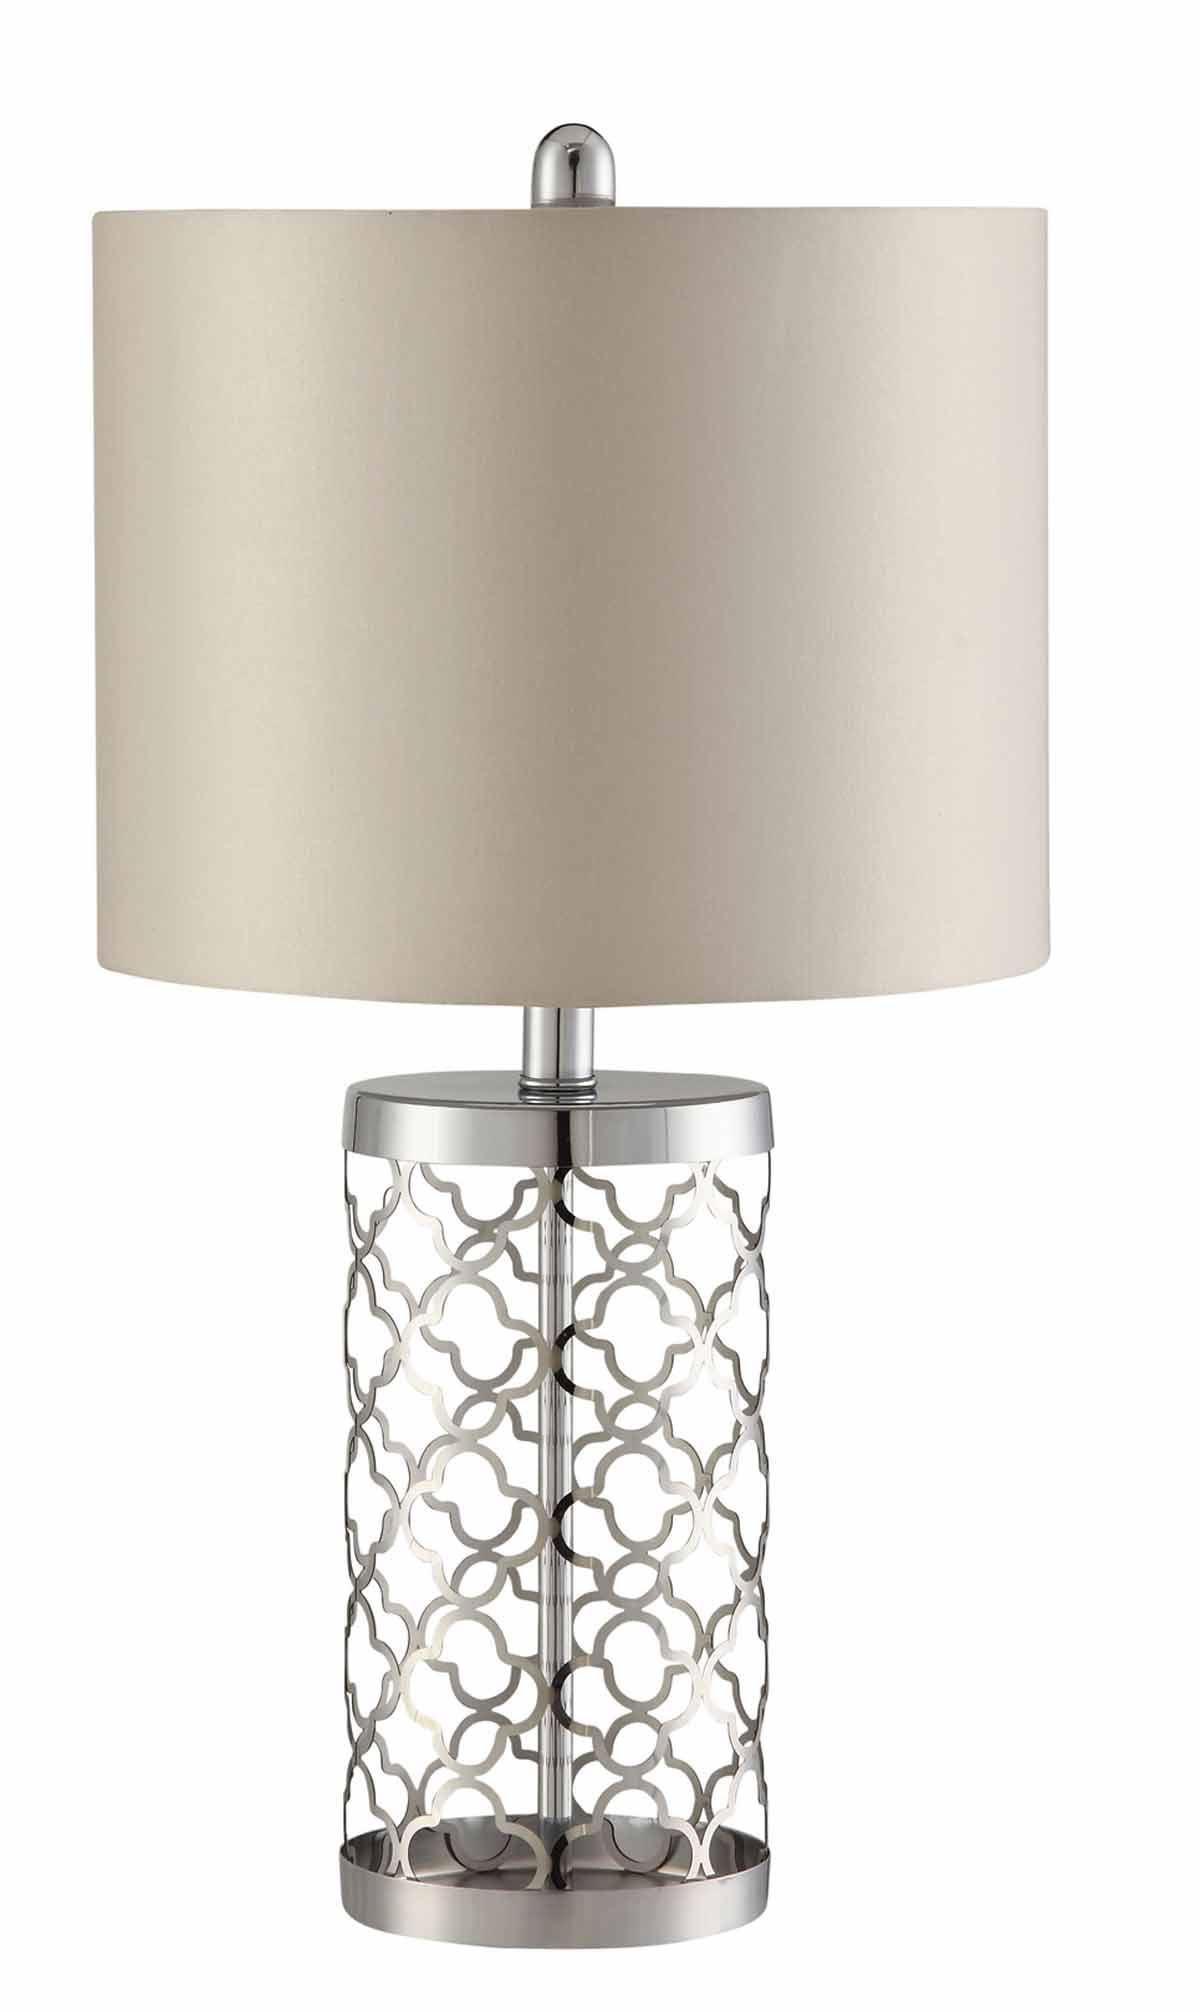 Coaster 901314 Table Lamp - Light Gold